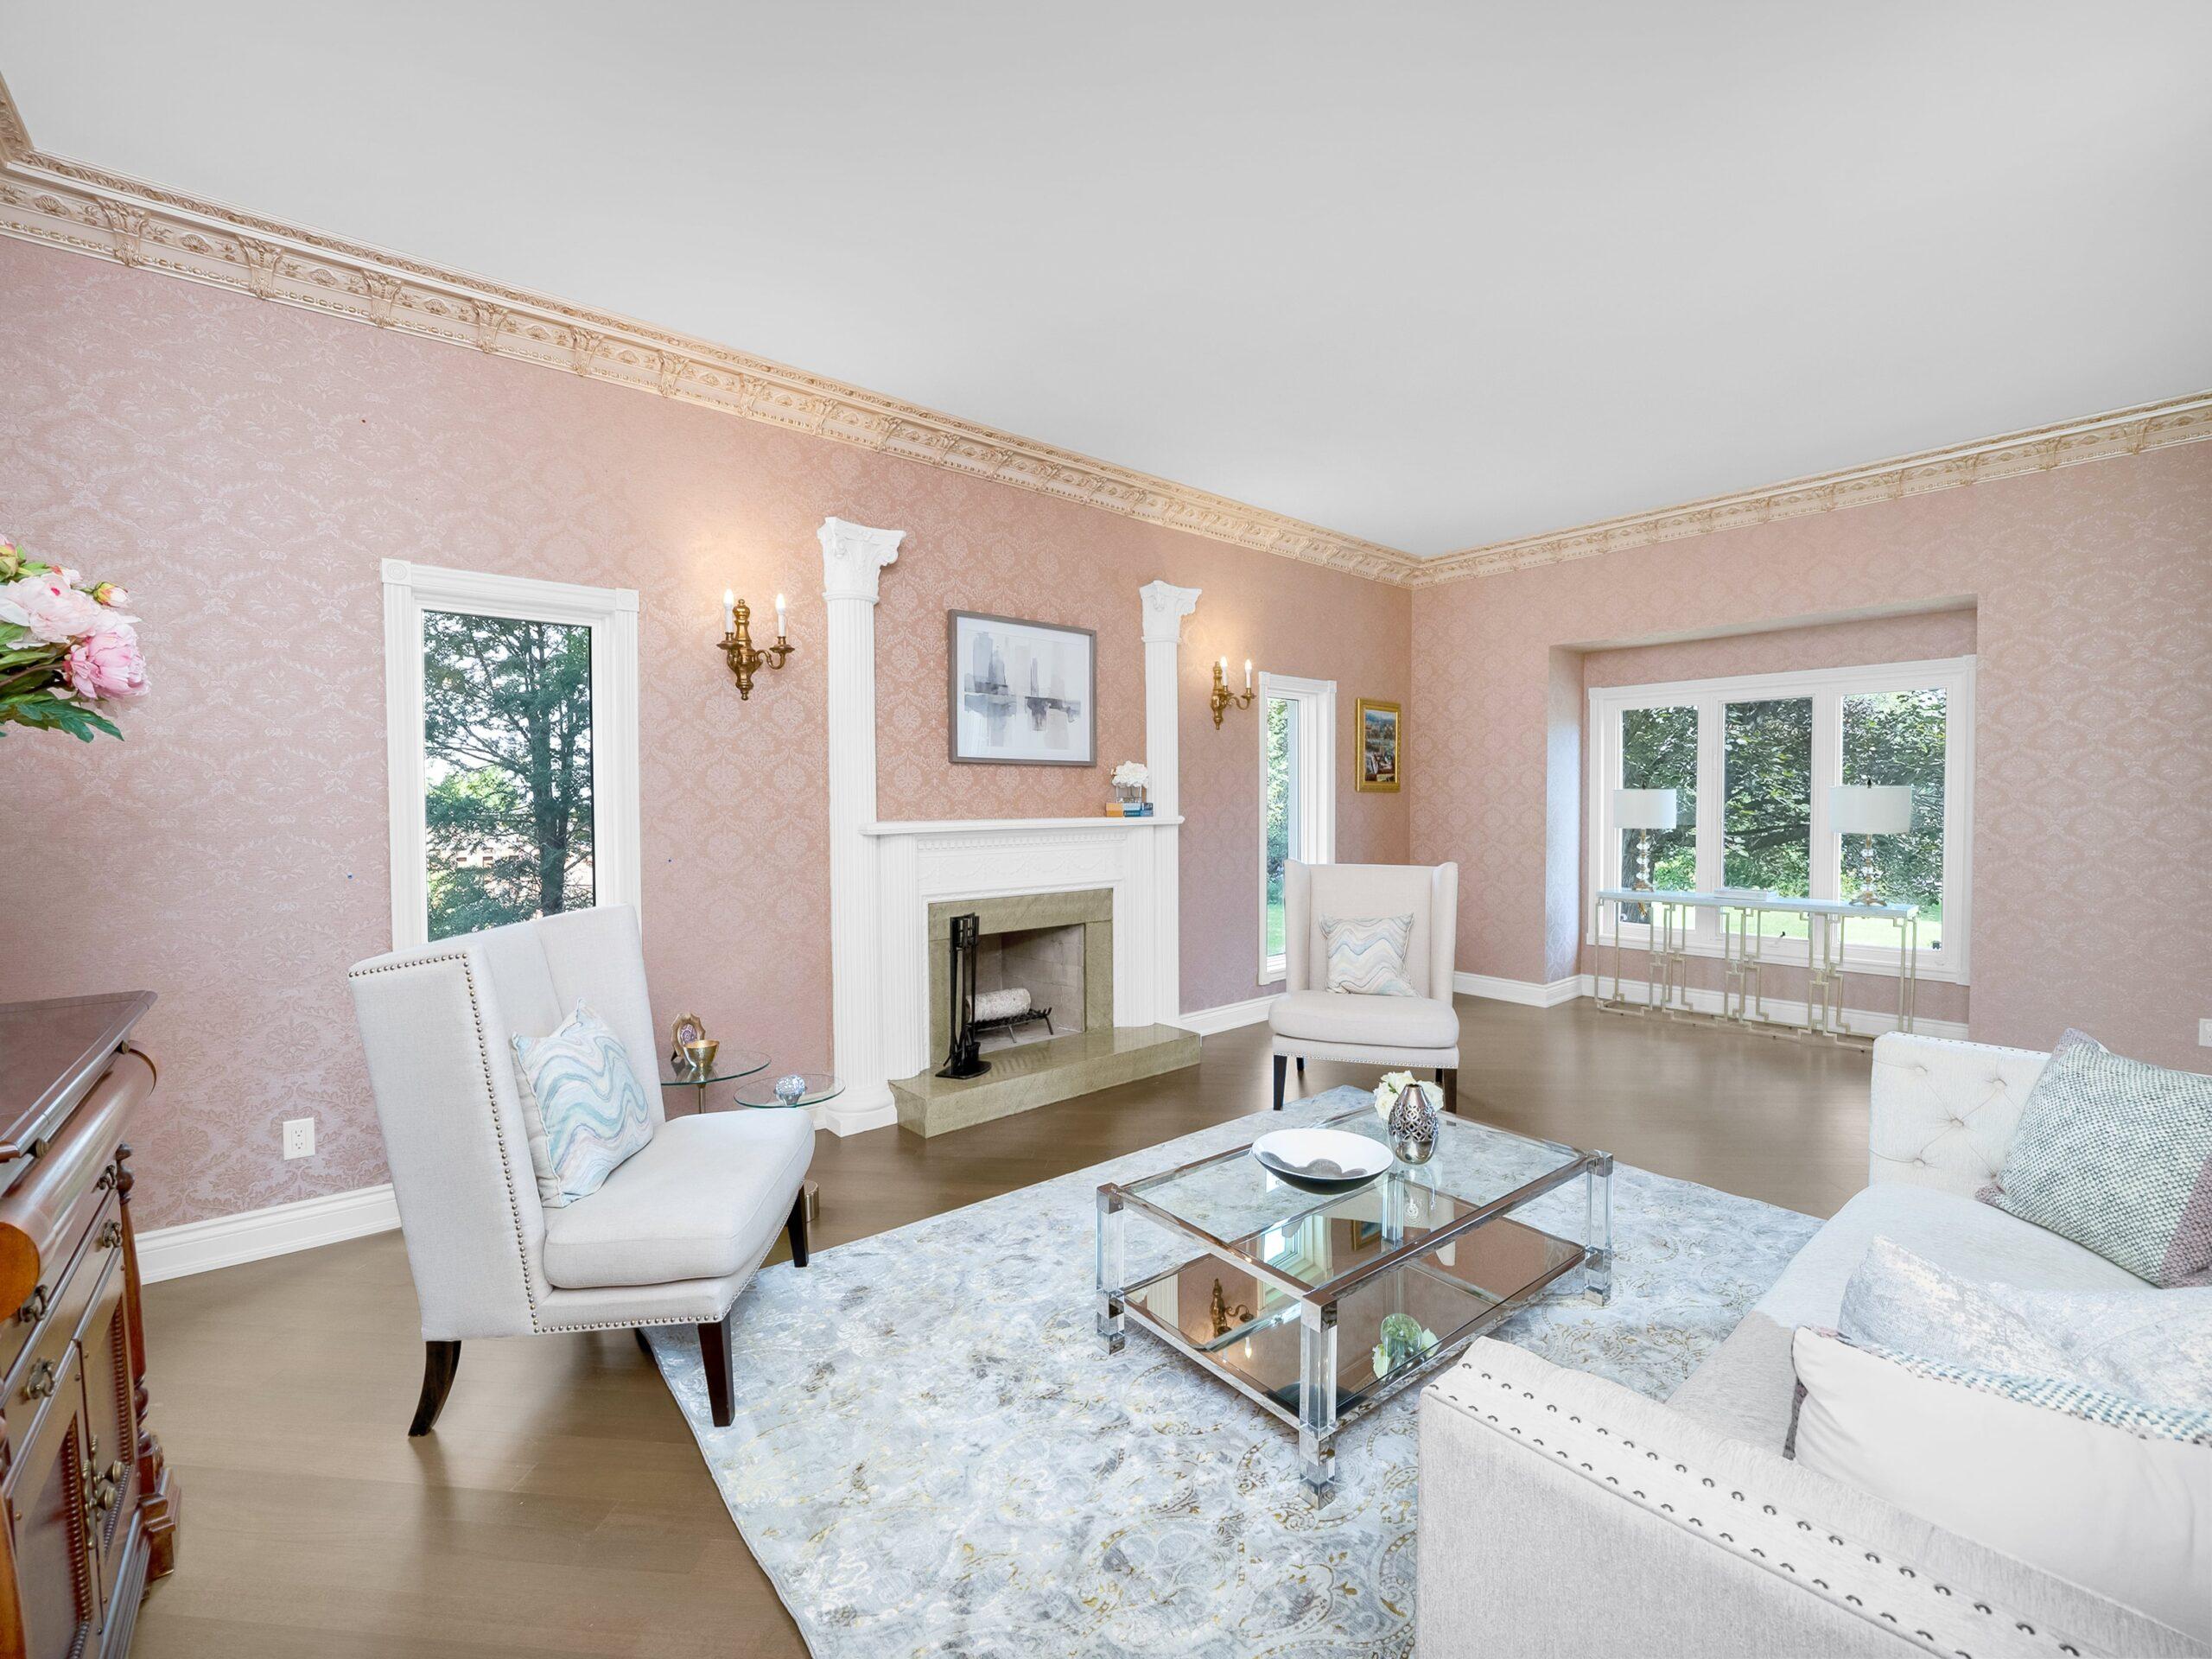 015B-Living Room-4200x3150-min